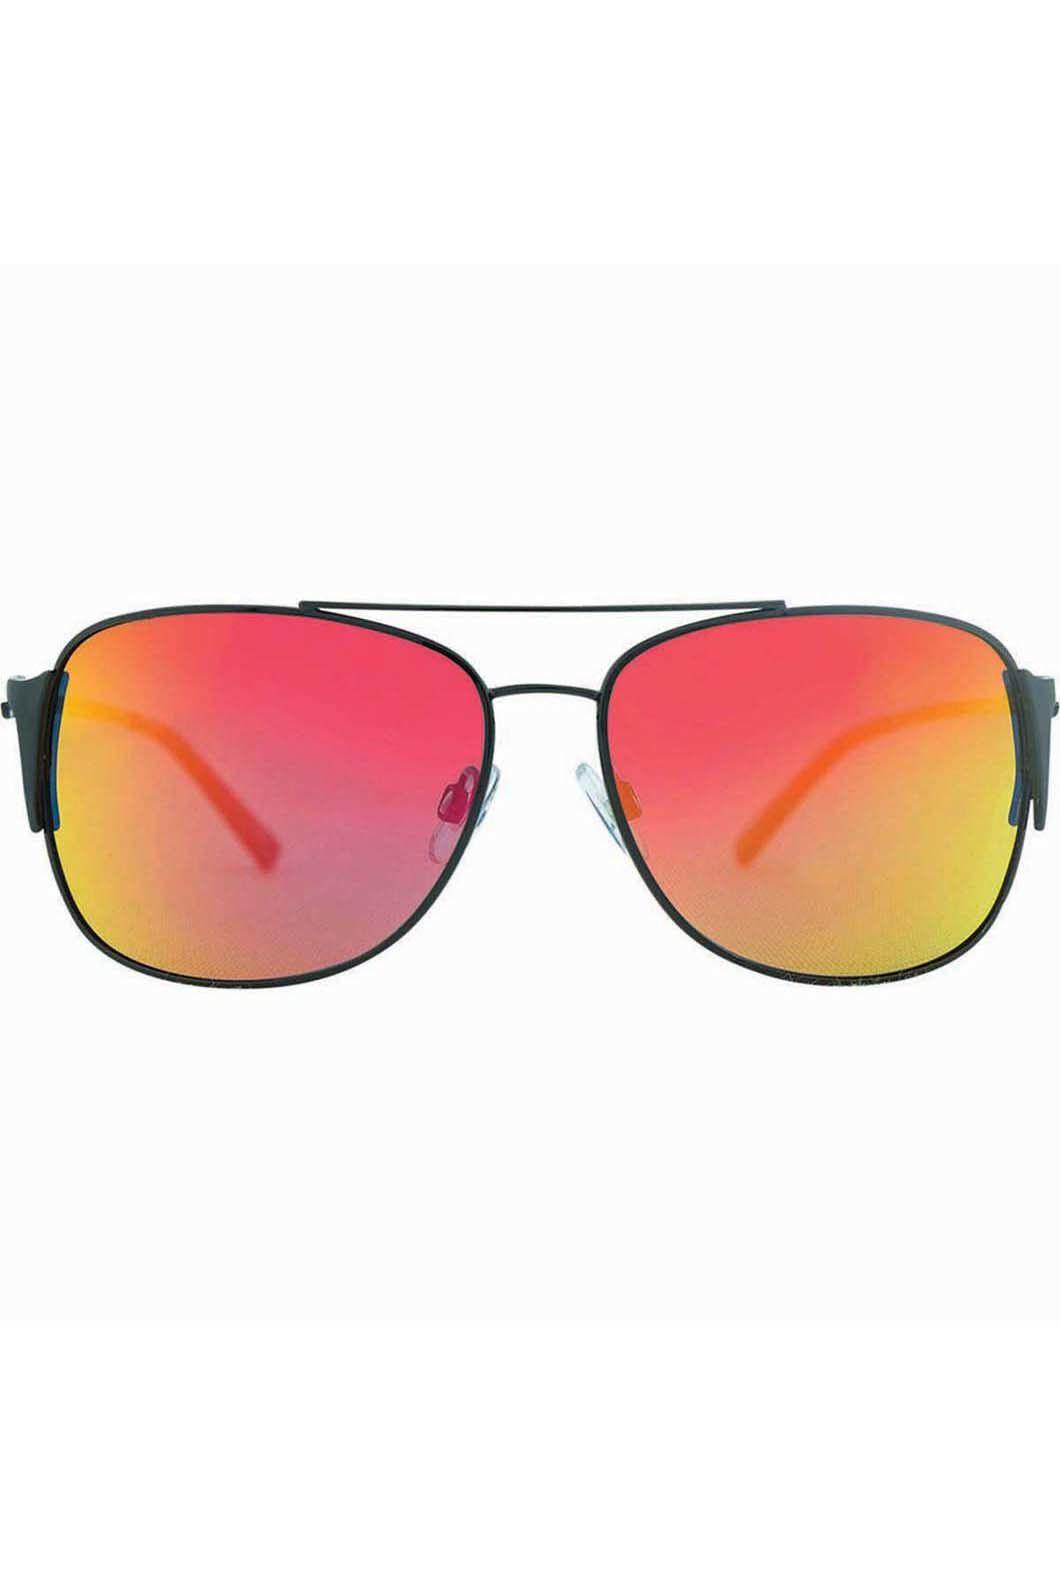 Venture Eyewear Men's Maverick Sunglasses, Black/Red, hi-res